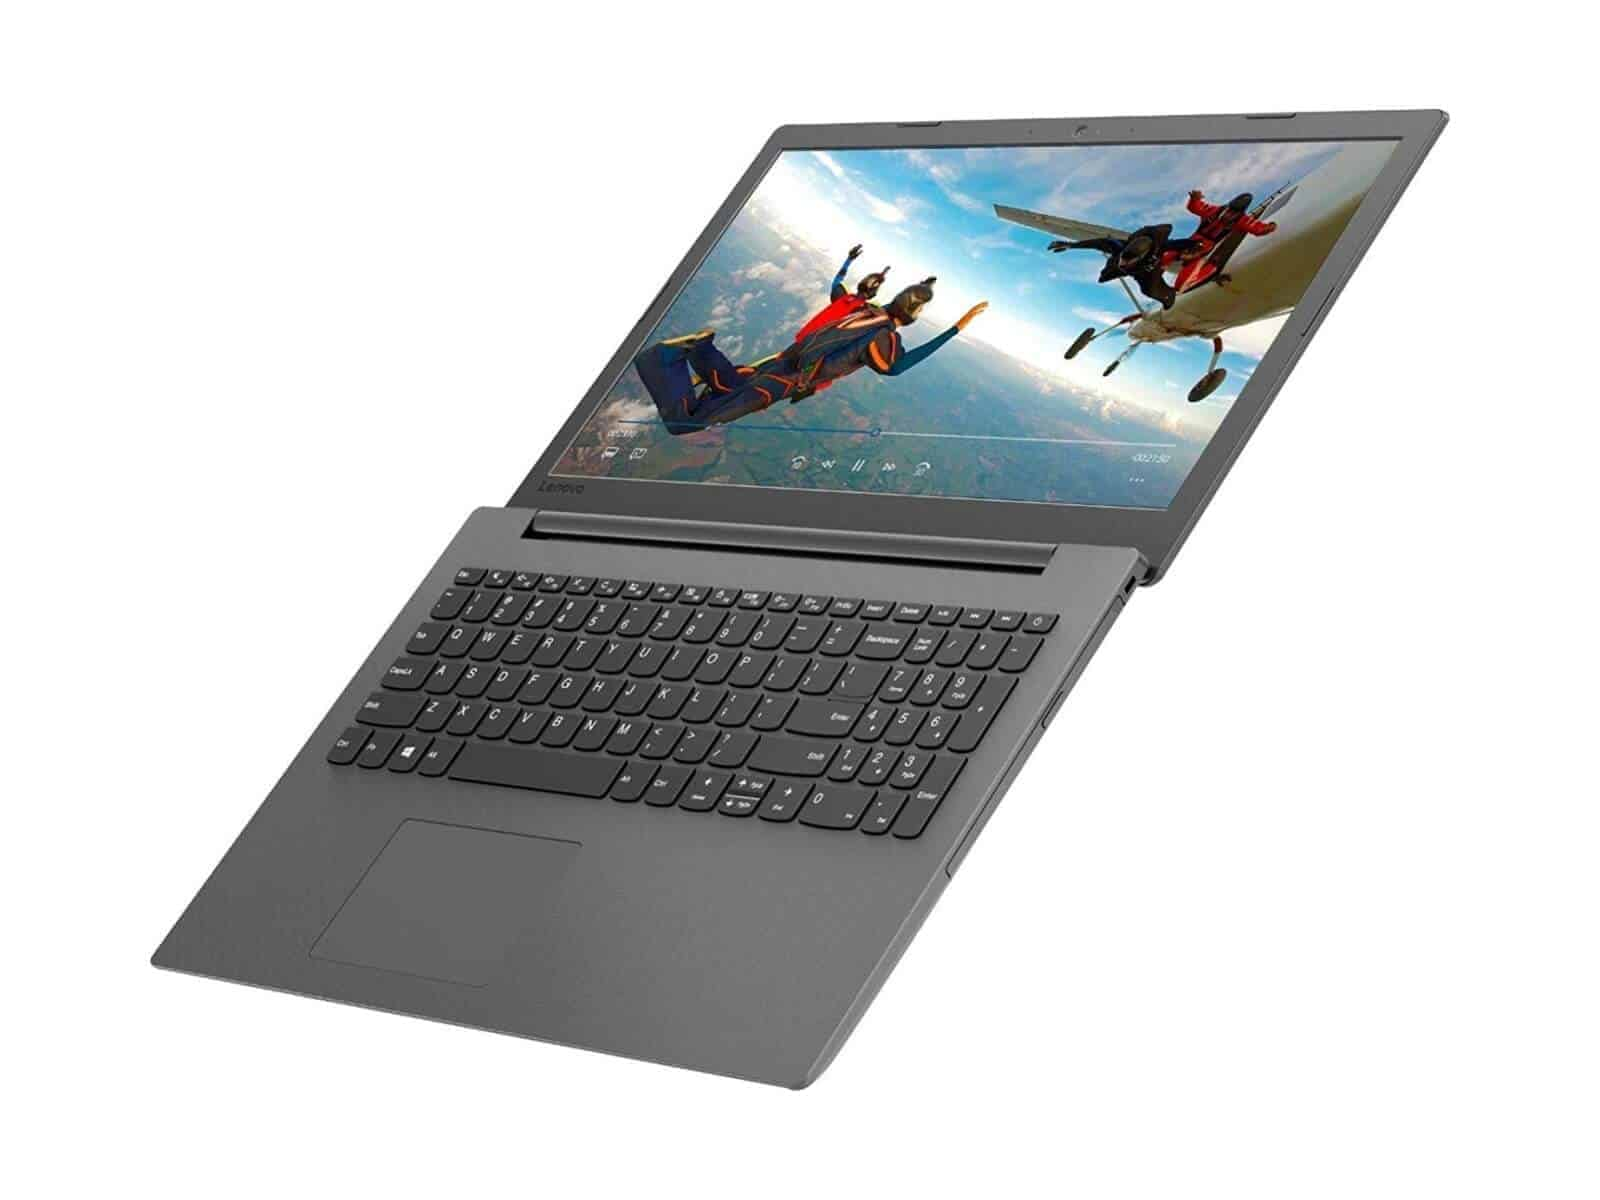 Lenovo Ideapad 130 15 6 Laptop Amd A4 4gb Ram 500gb Hdd Win 10 Home 81h5000tsa Tech Co Za